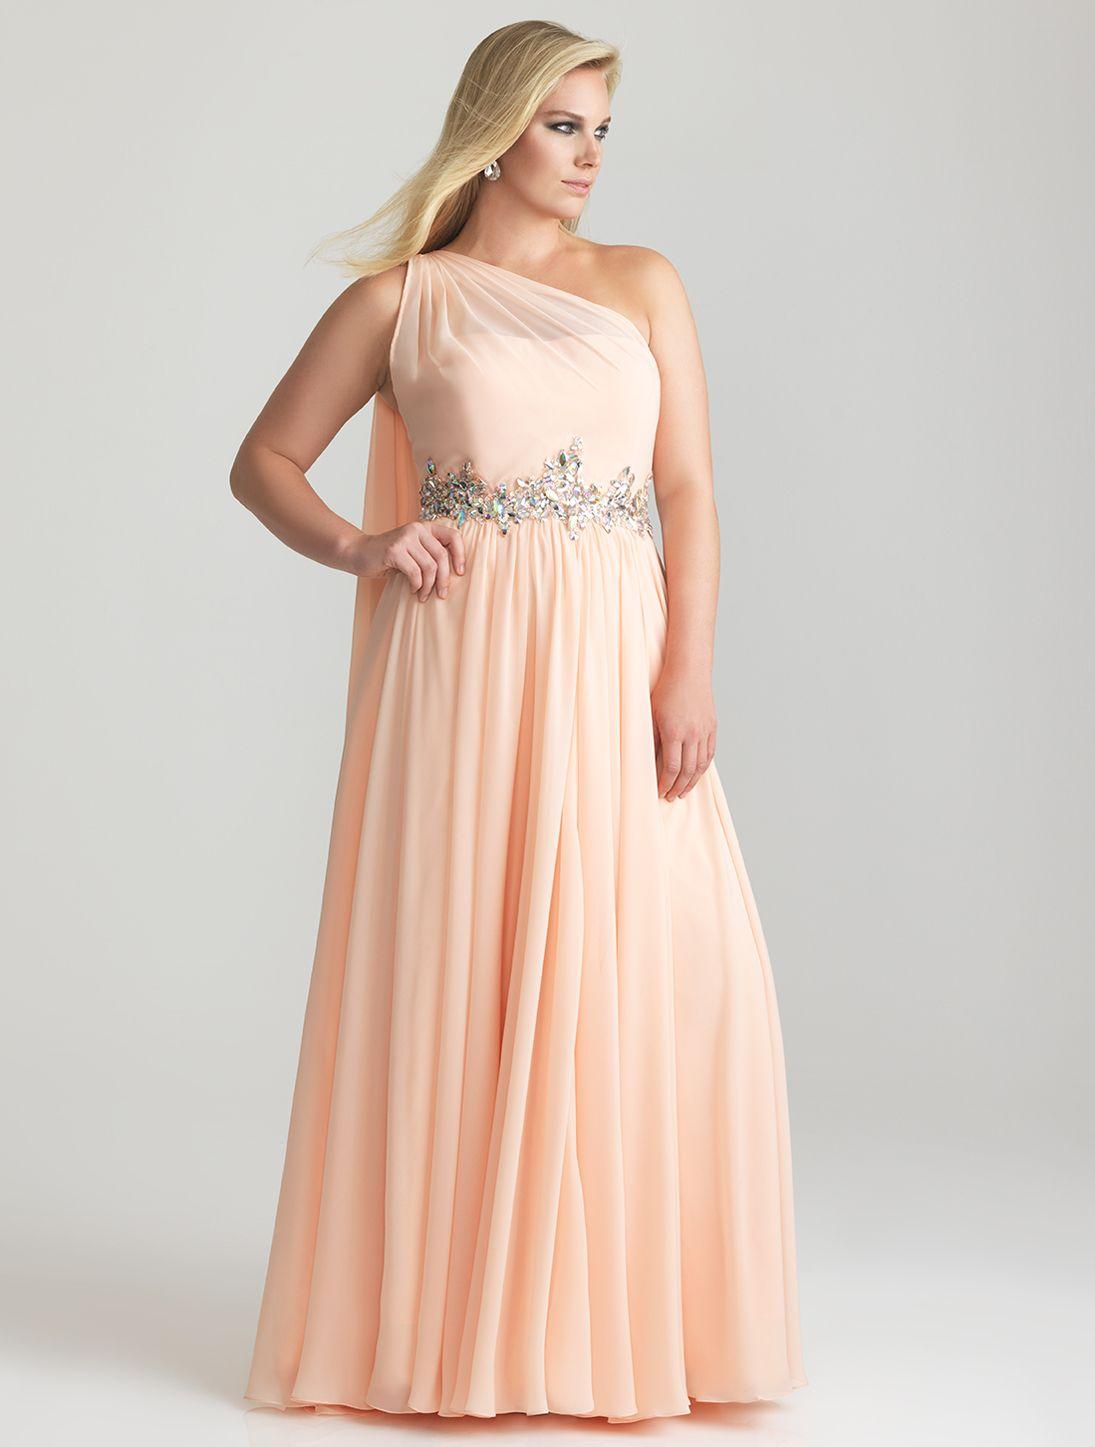 6587f48cd0 Peach Chiffon One Shoulder Embellished Empire Waist Plus Size Prom Dress -  Unique Vintage - Cocktail